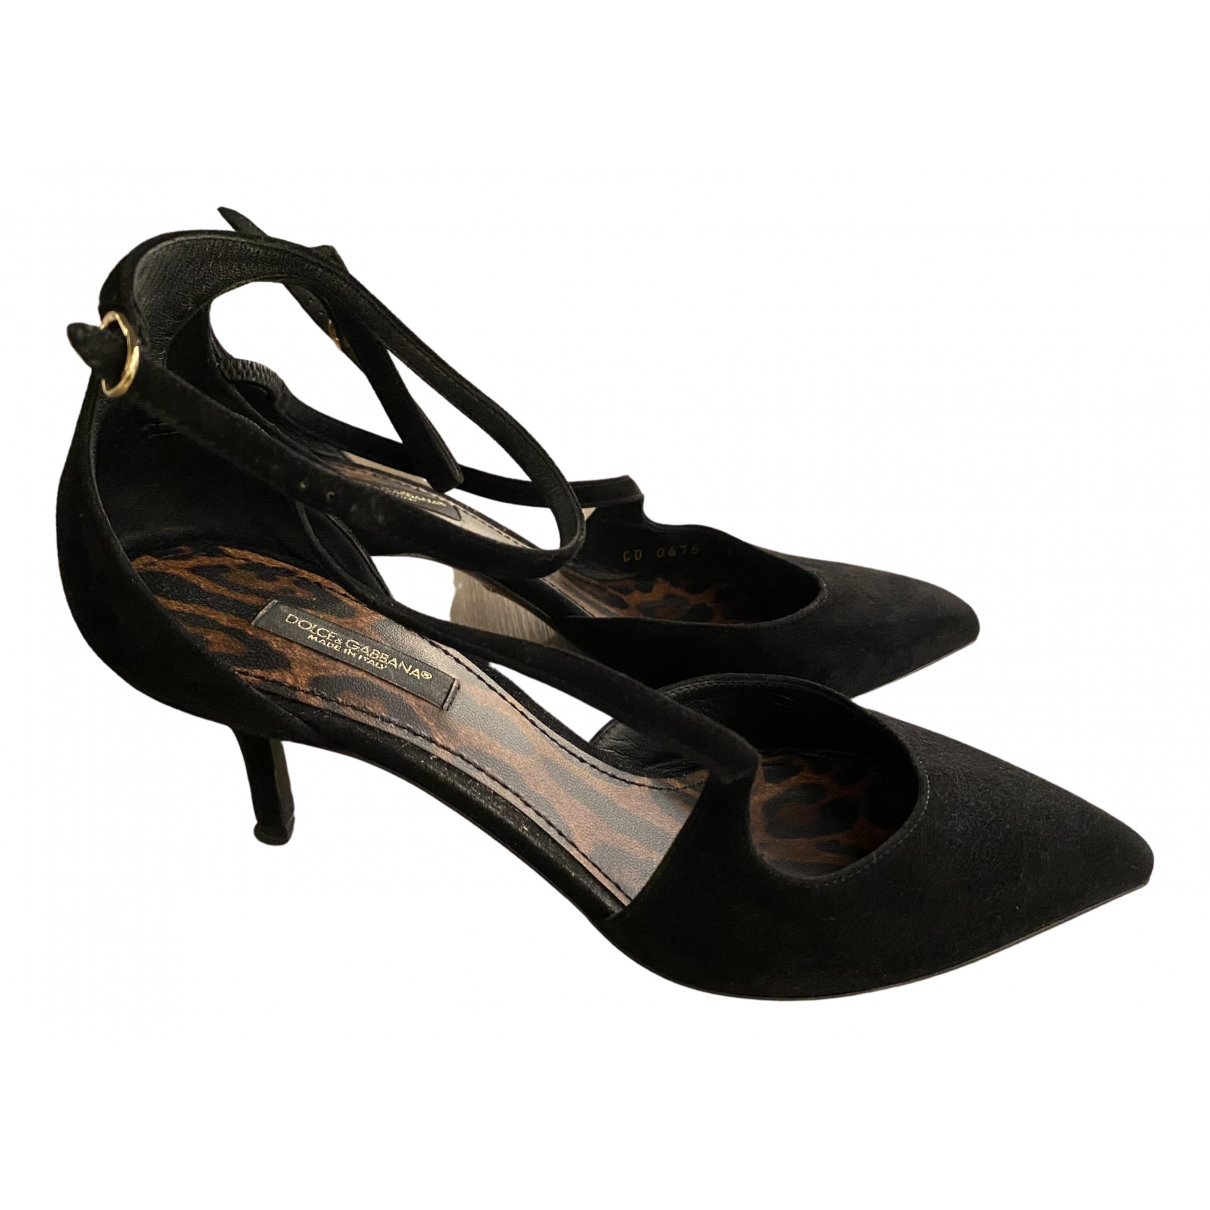 Dolce & Gabbana \N Black Suede Sandals for Women 37.5 EU